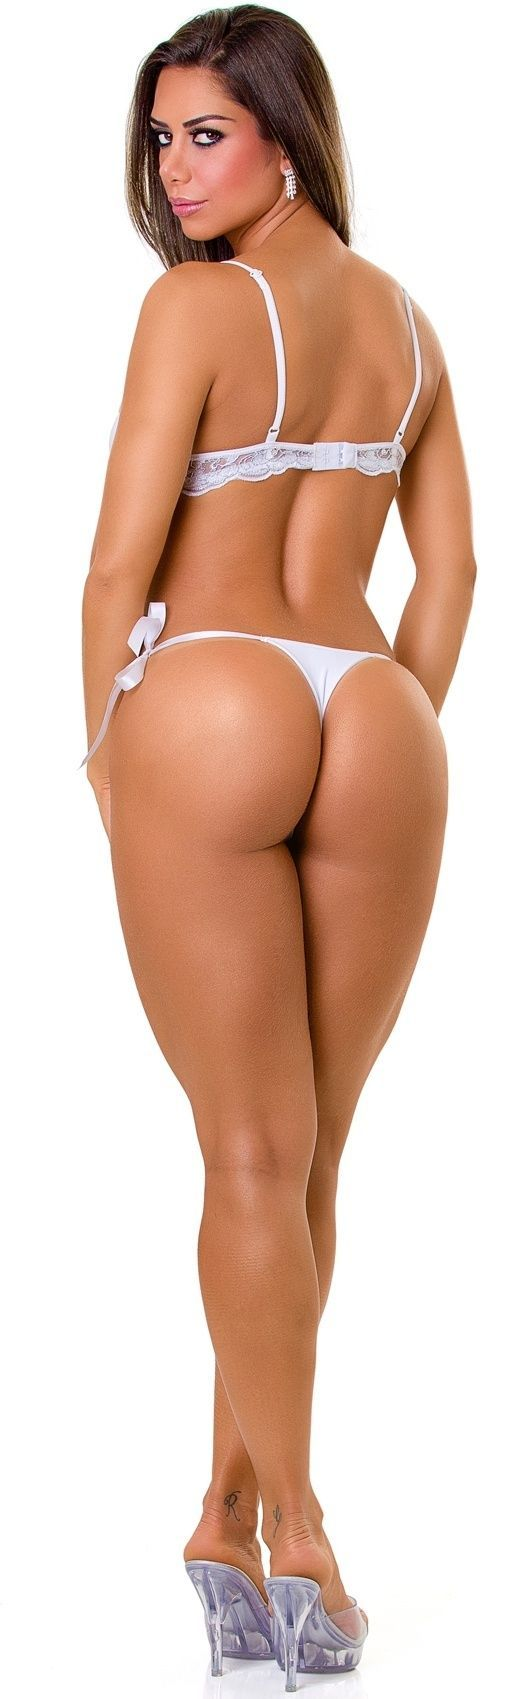 Hot naked colombian women